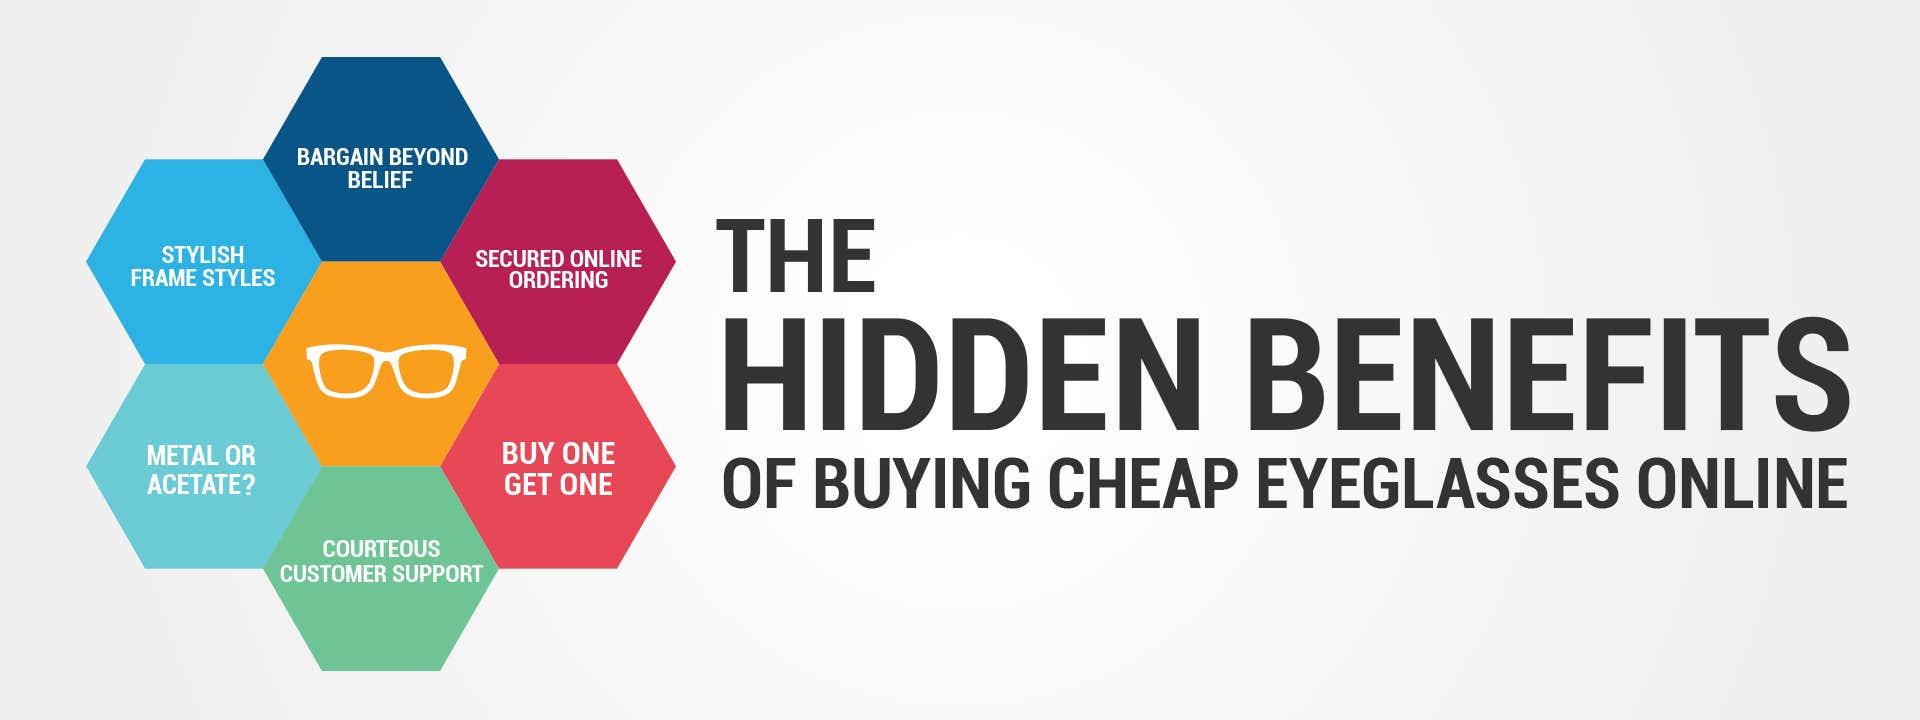 The Hidden Benefits of Buying Cheap Eyeglasses Online